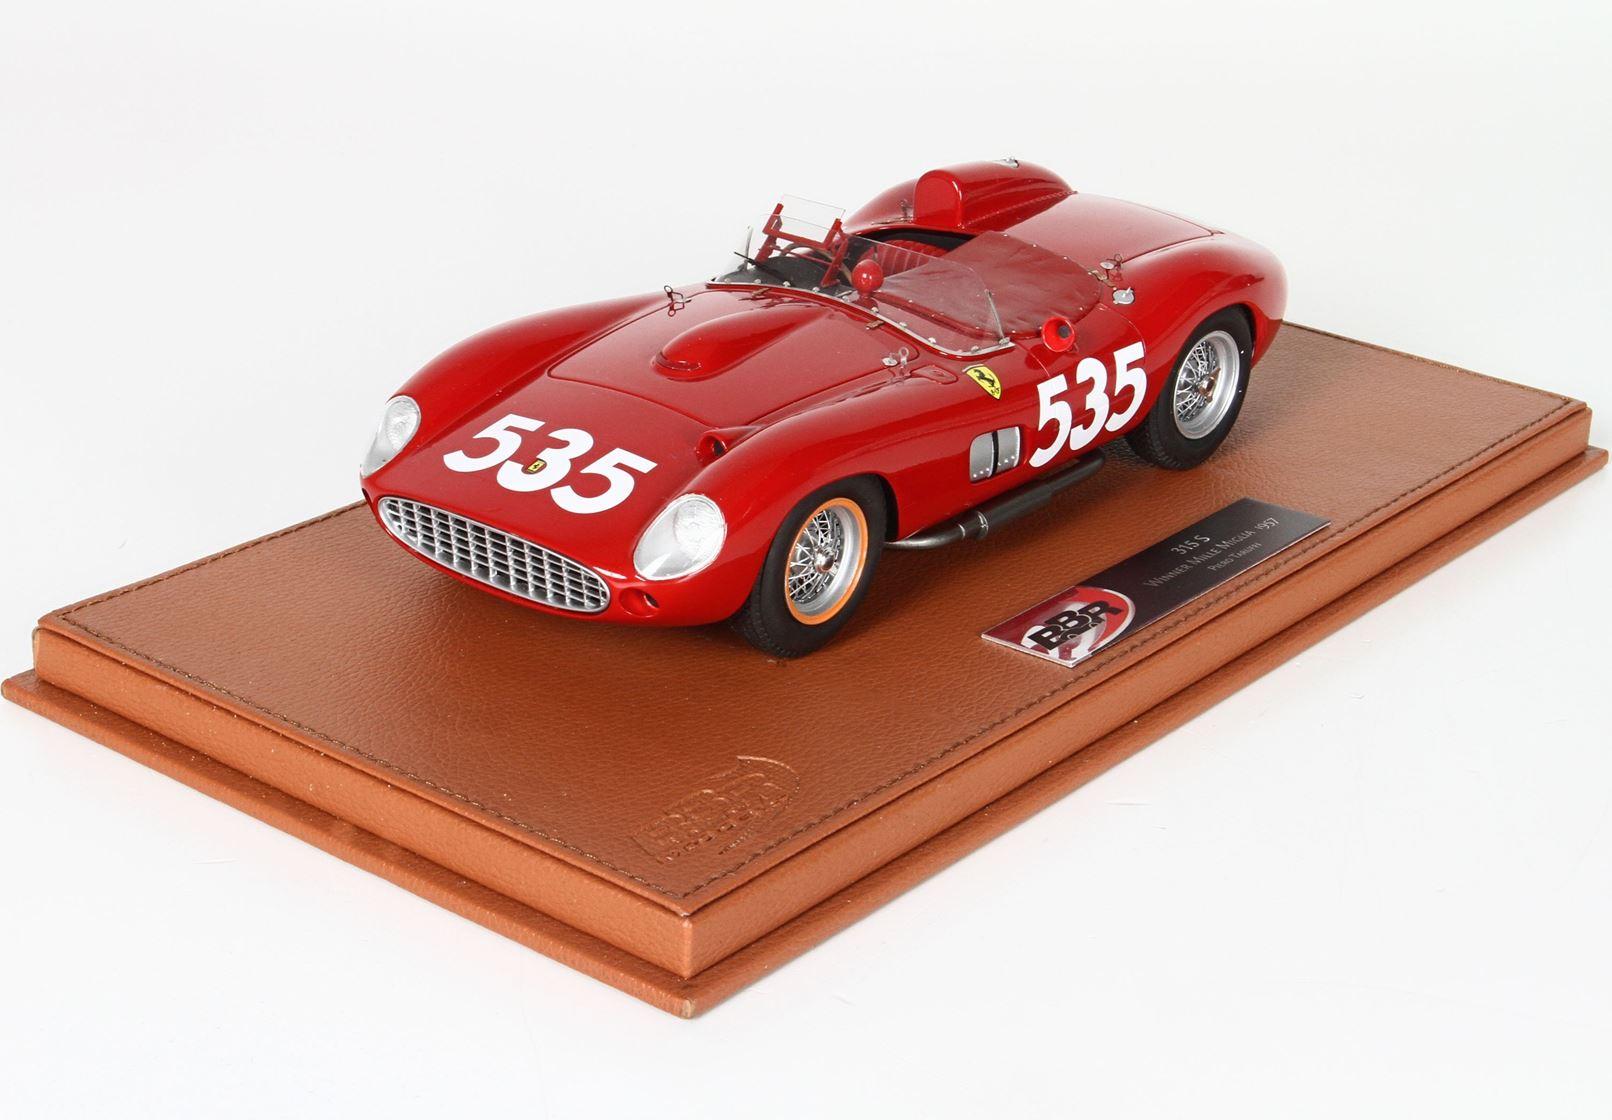 Ferrari 315 S Winner Mille Miglia 1957 Taruffi SN 068 Ltd 200 Pieces 1/18